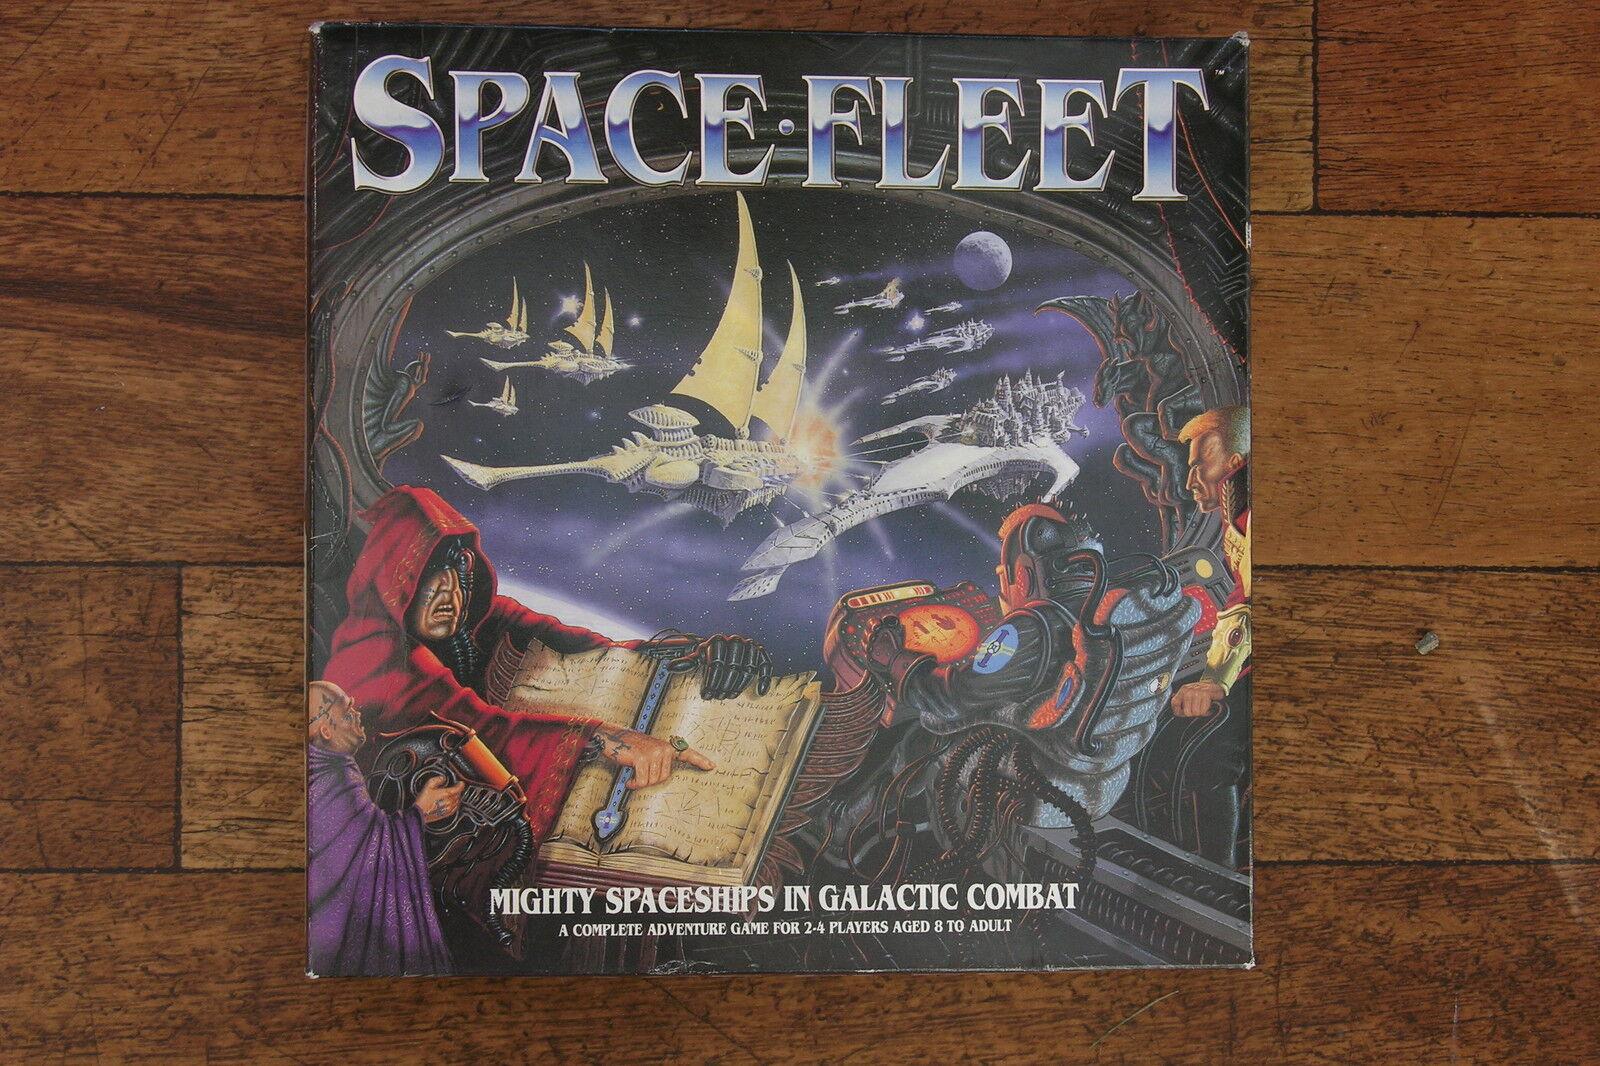 GW SPACE-FLEET COMPLETE PLUS PLUS PLUS EXTRA's , PARTIALLY UNPUNCHED 0a36b7